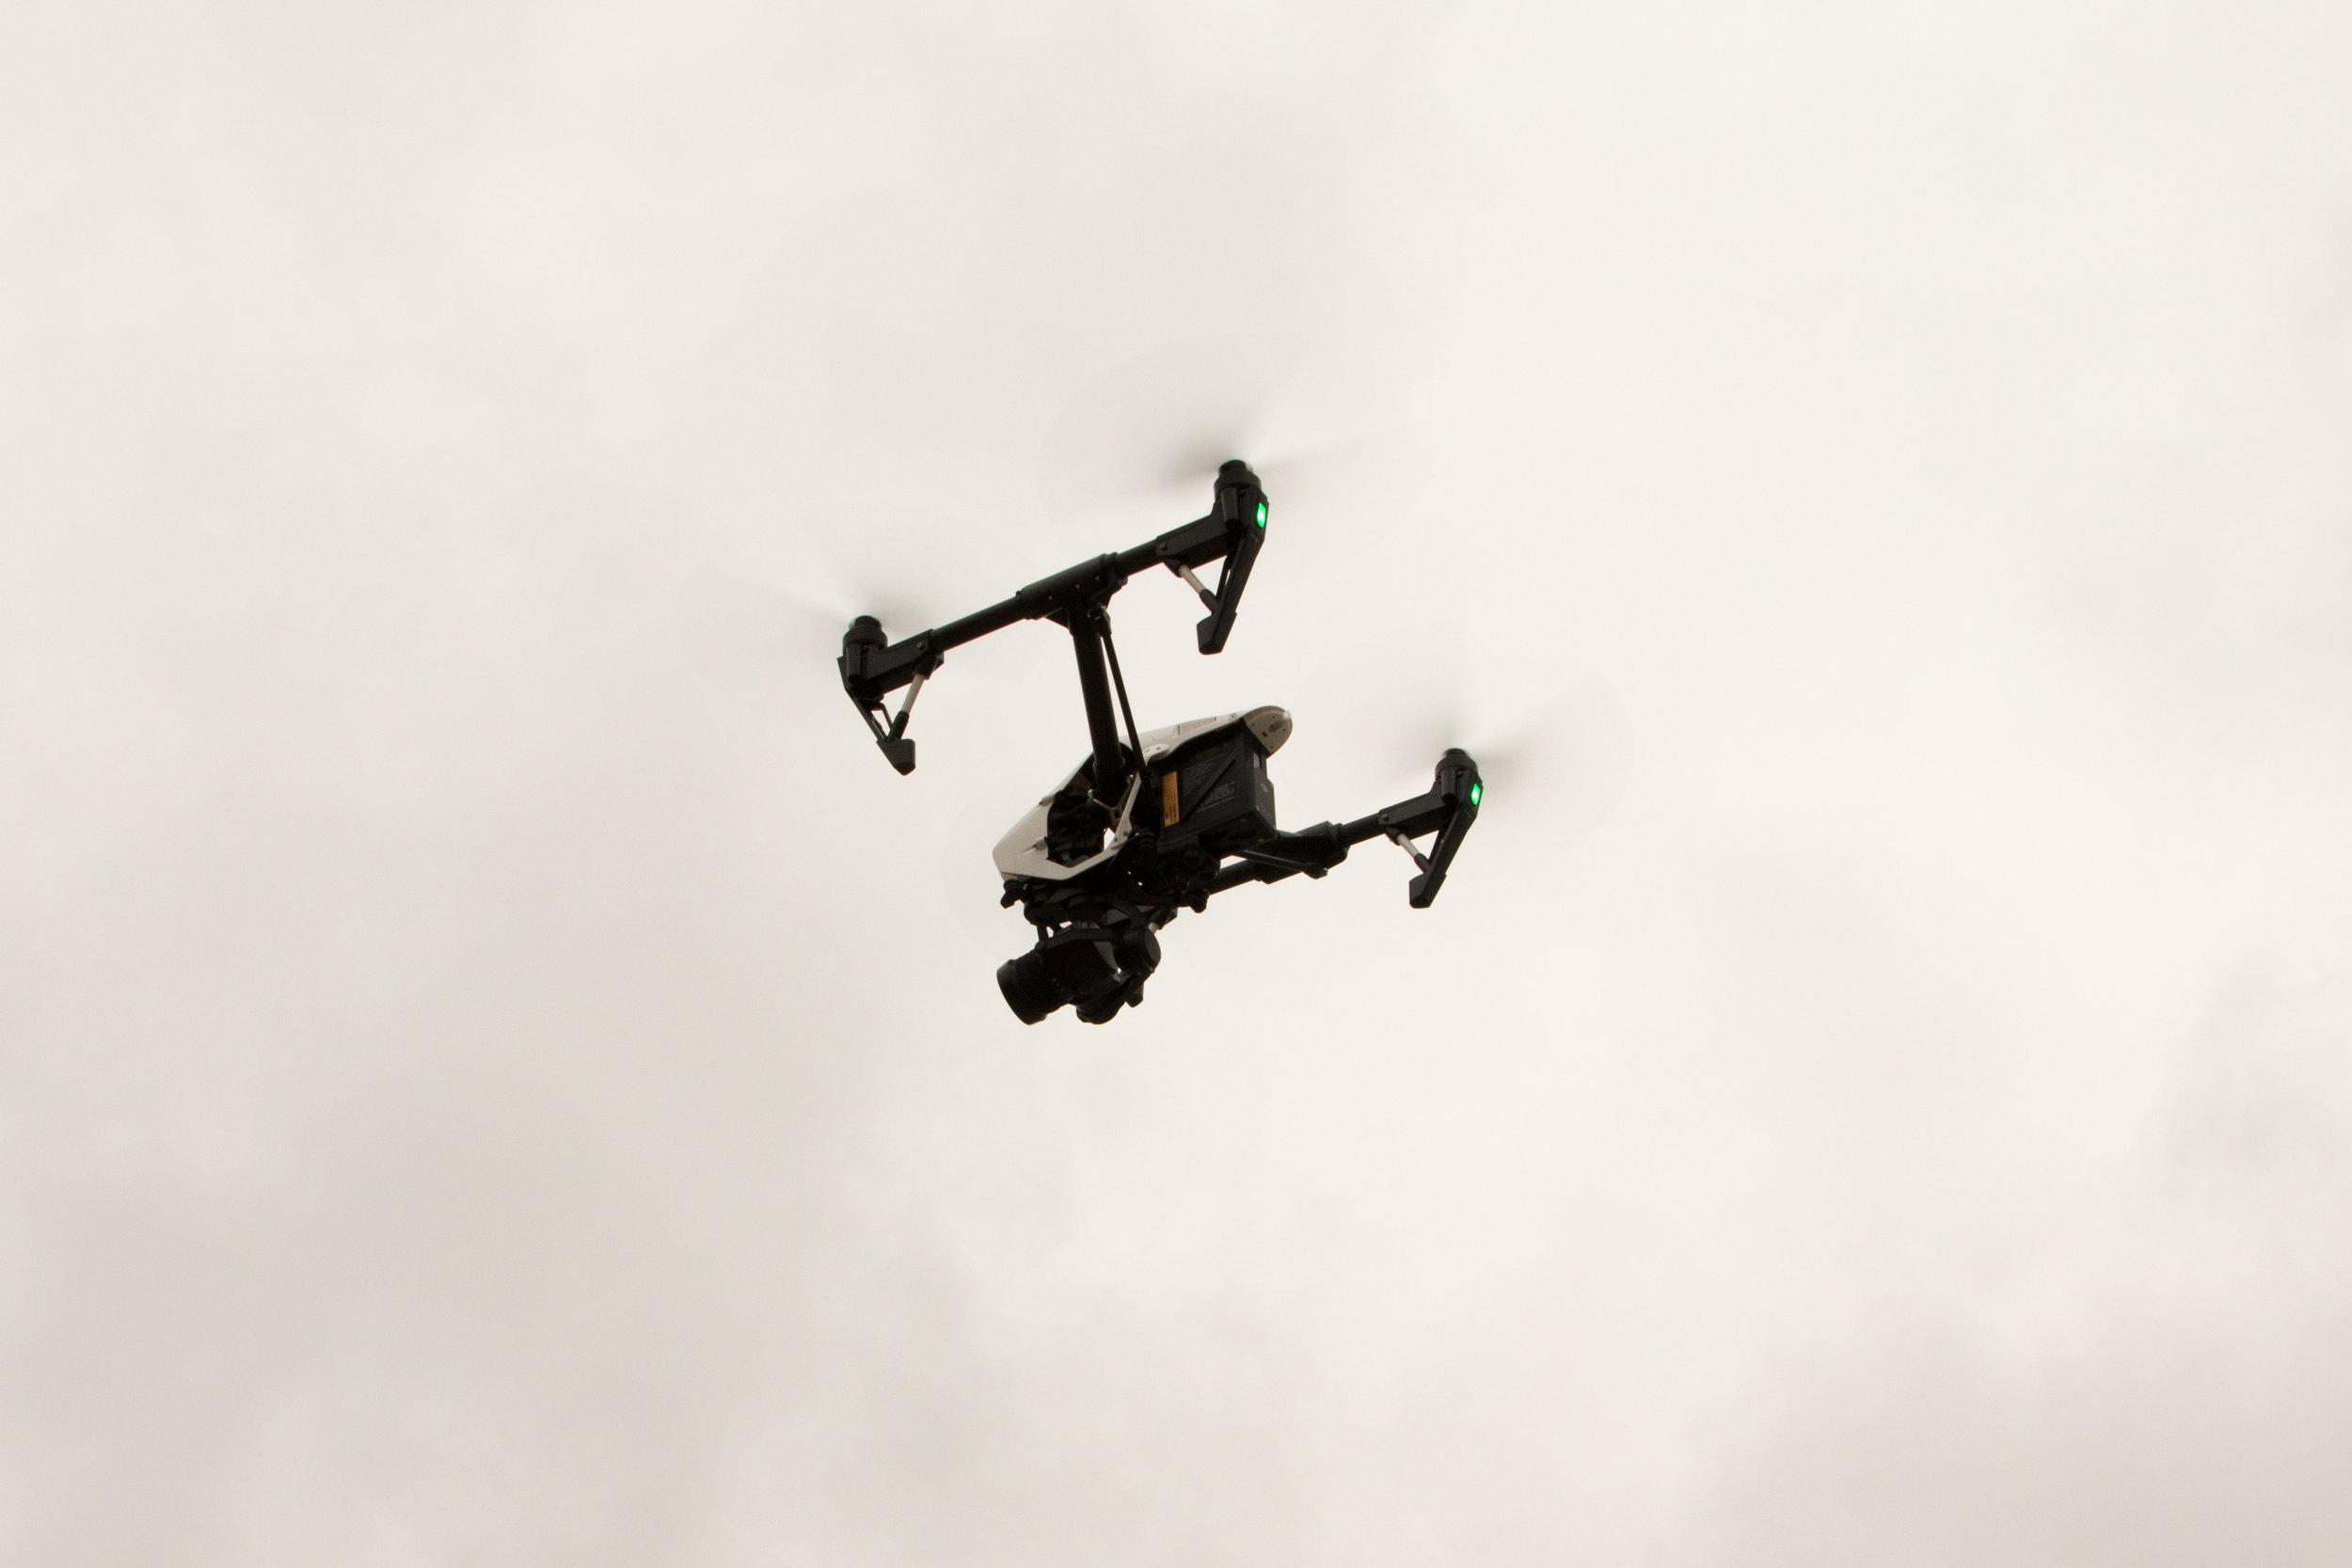 quadcopter mid-flight